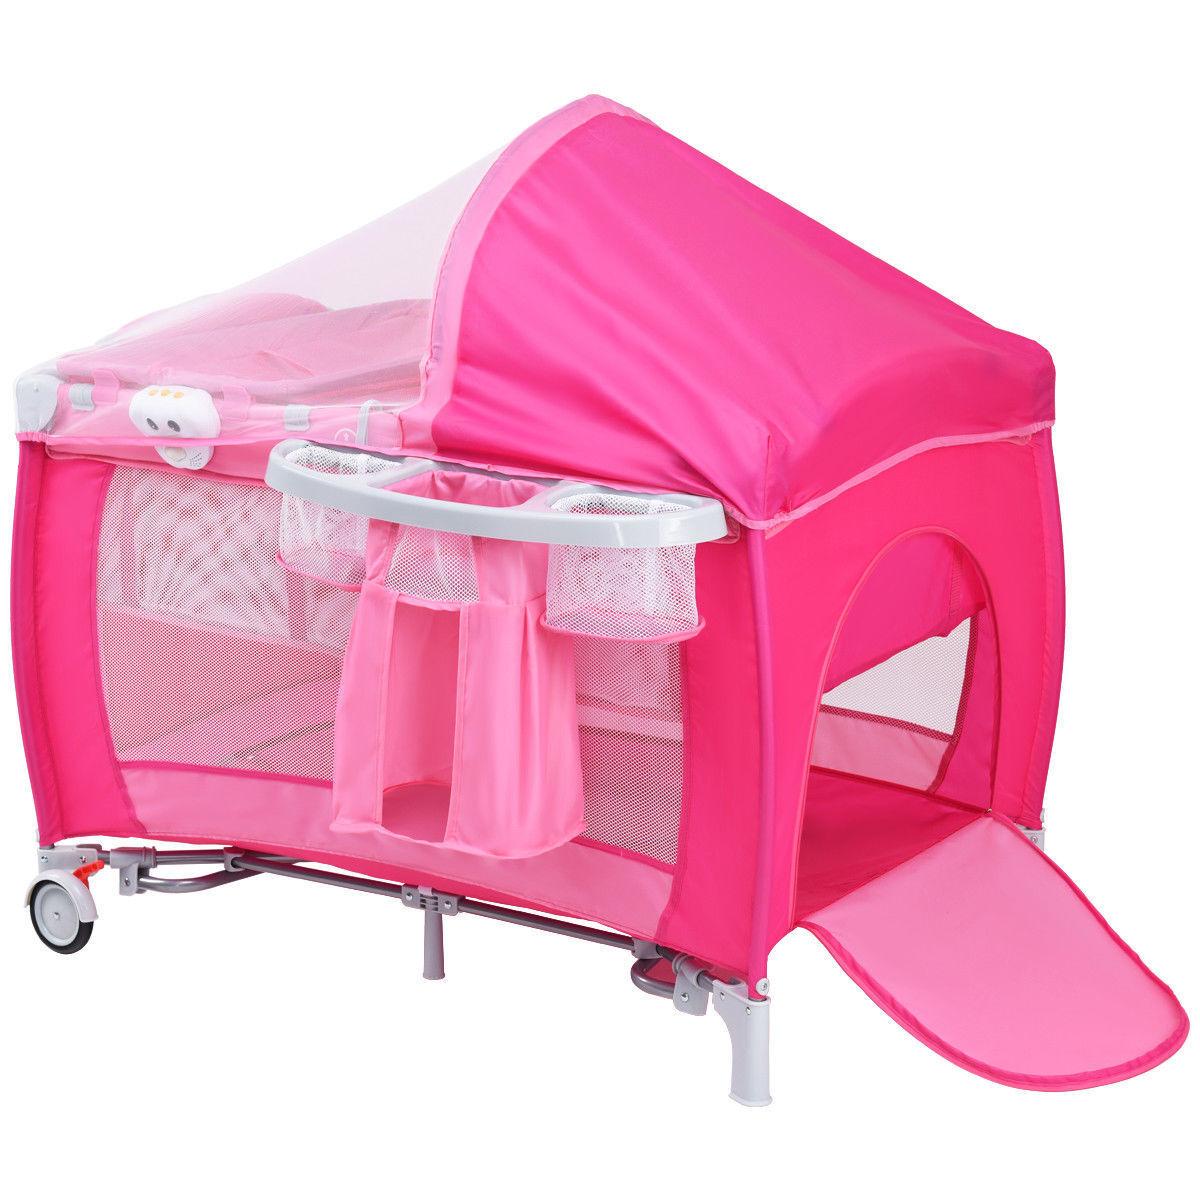 Pink Portable Folding Infant Baby Crib Playpen Bassinet Bed